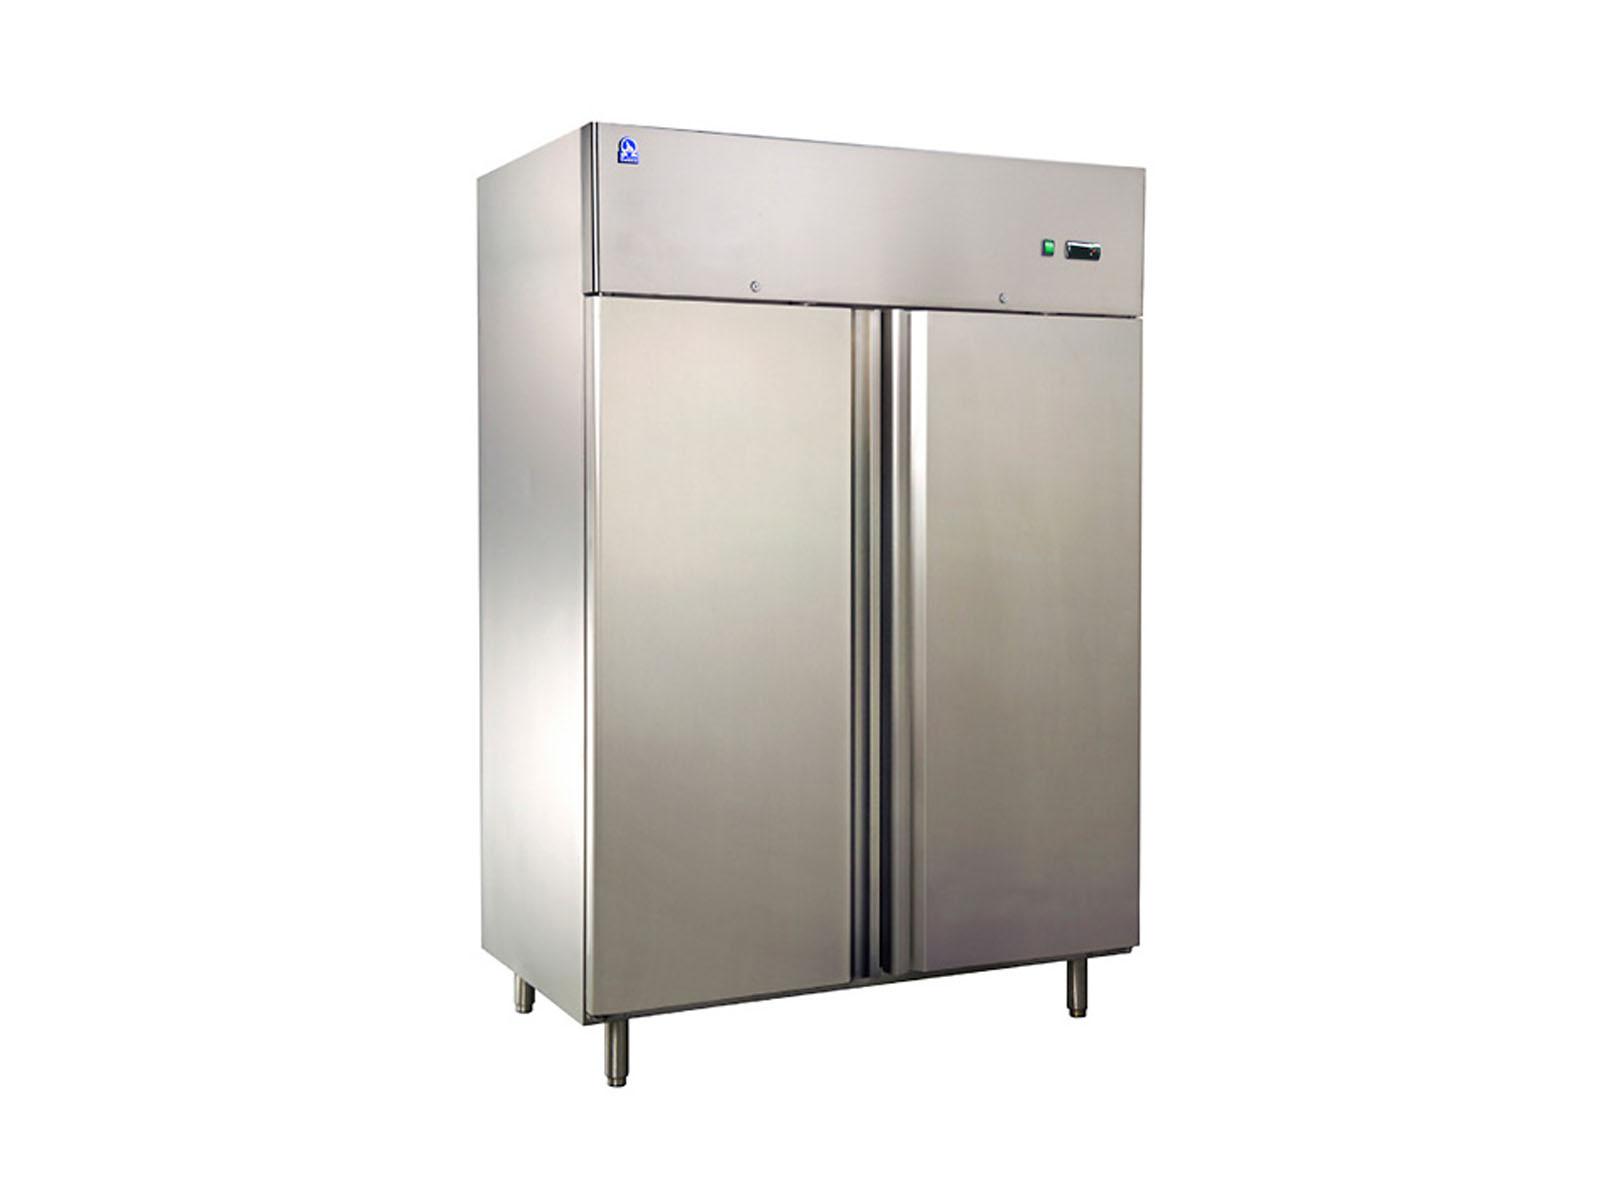 INOX cabinets